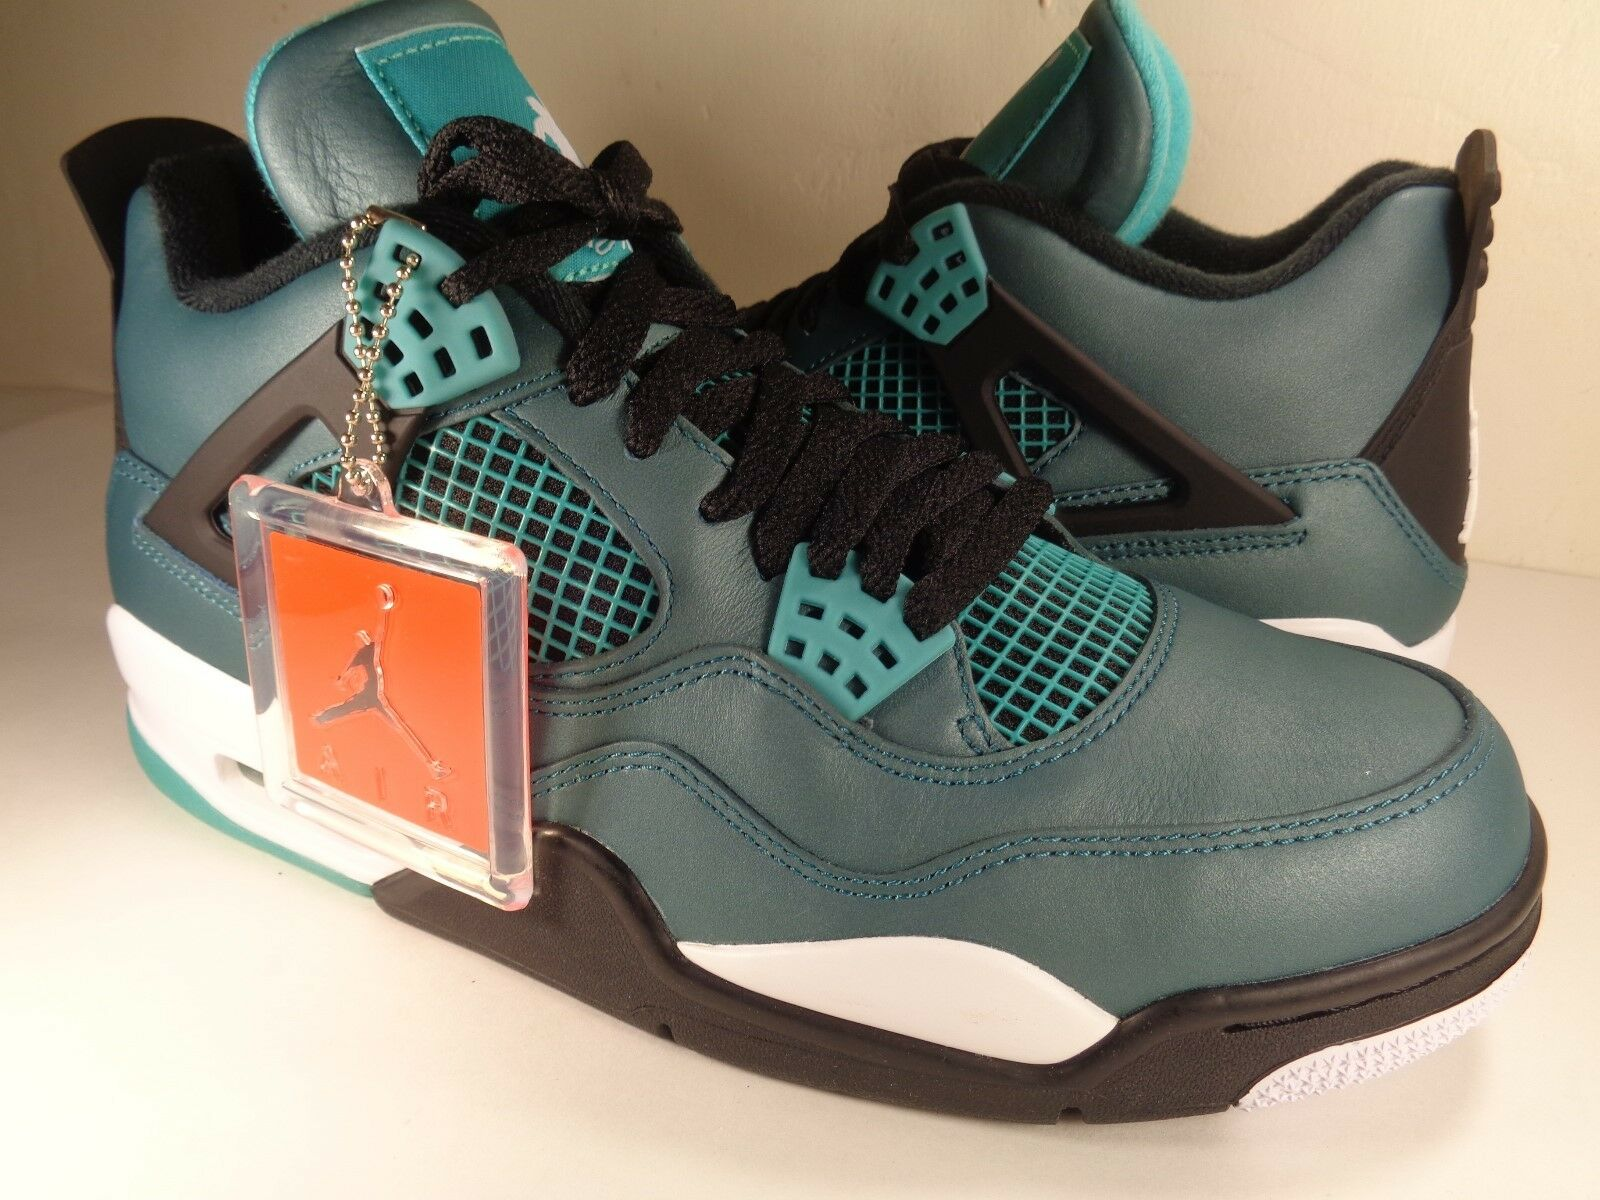 Jordan Nike 4 Retro 30th Nike Jordan Air Anniversary Verde Azulado Blanco Negro (705331330) f7a191